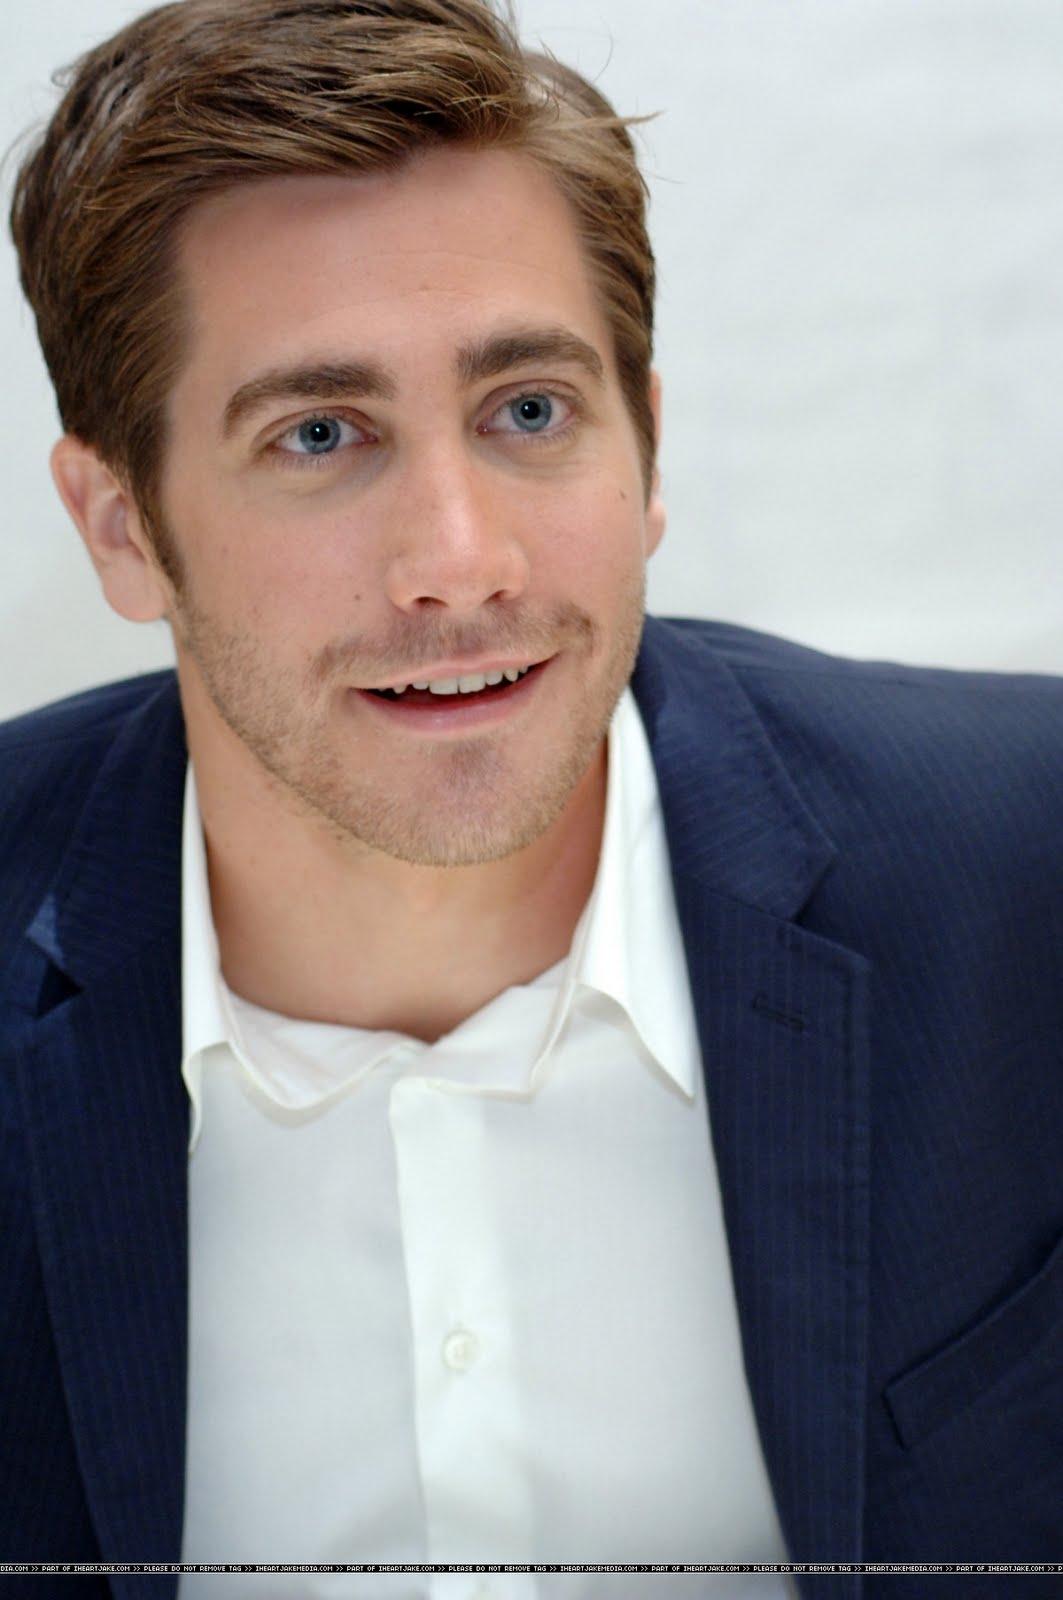 WEIRDLAND: New old pictures of Jake Gyllenhaal |Old Jake Gyllenhaal